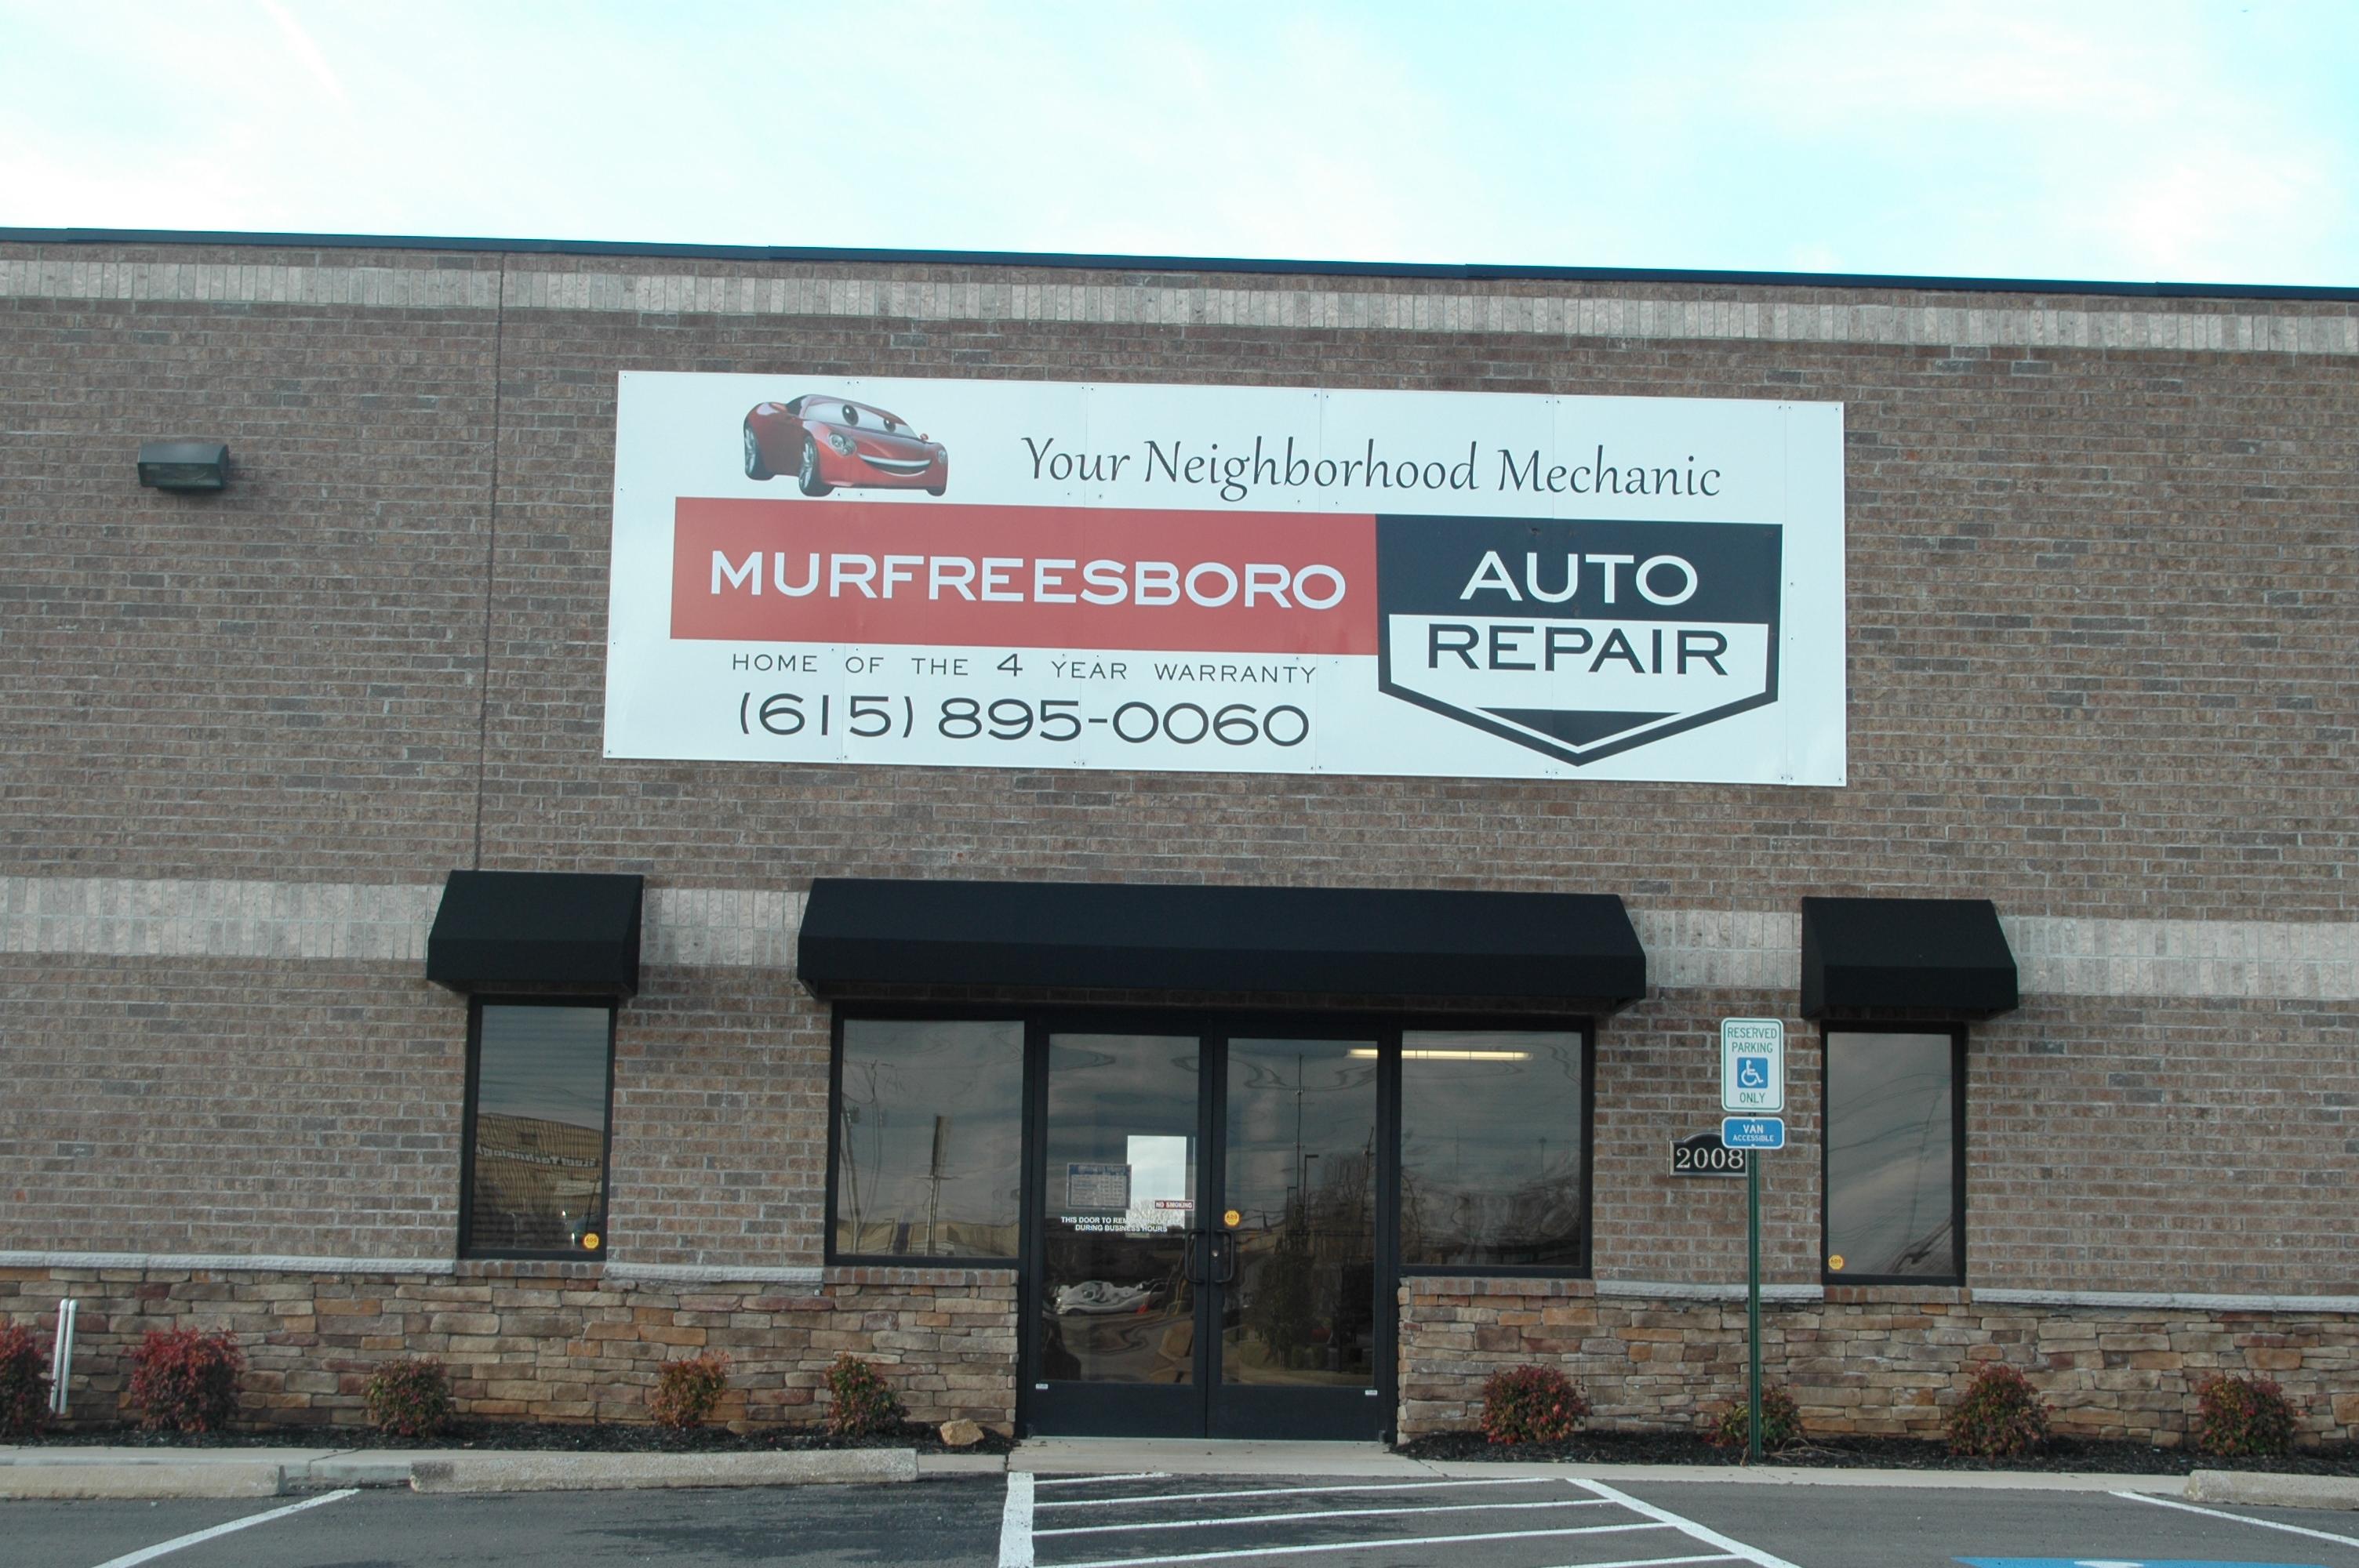 murfreesboro auto repair murfreesboro tennessee. Black Bedroom Furniture Sets. Home Design Ideas